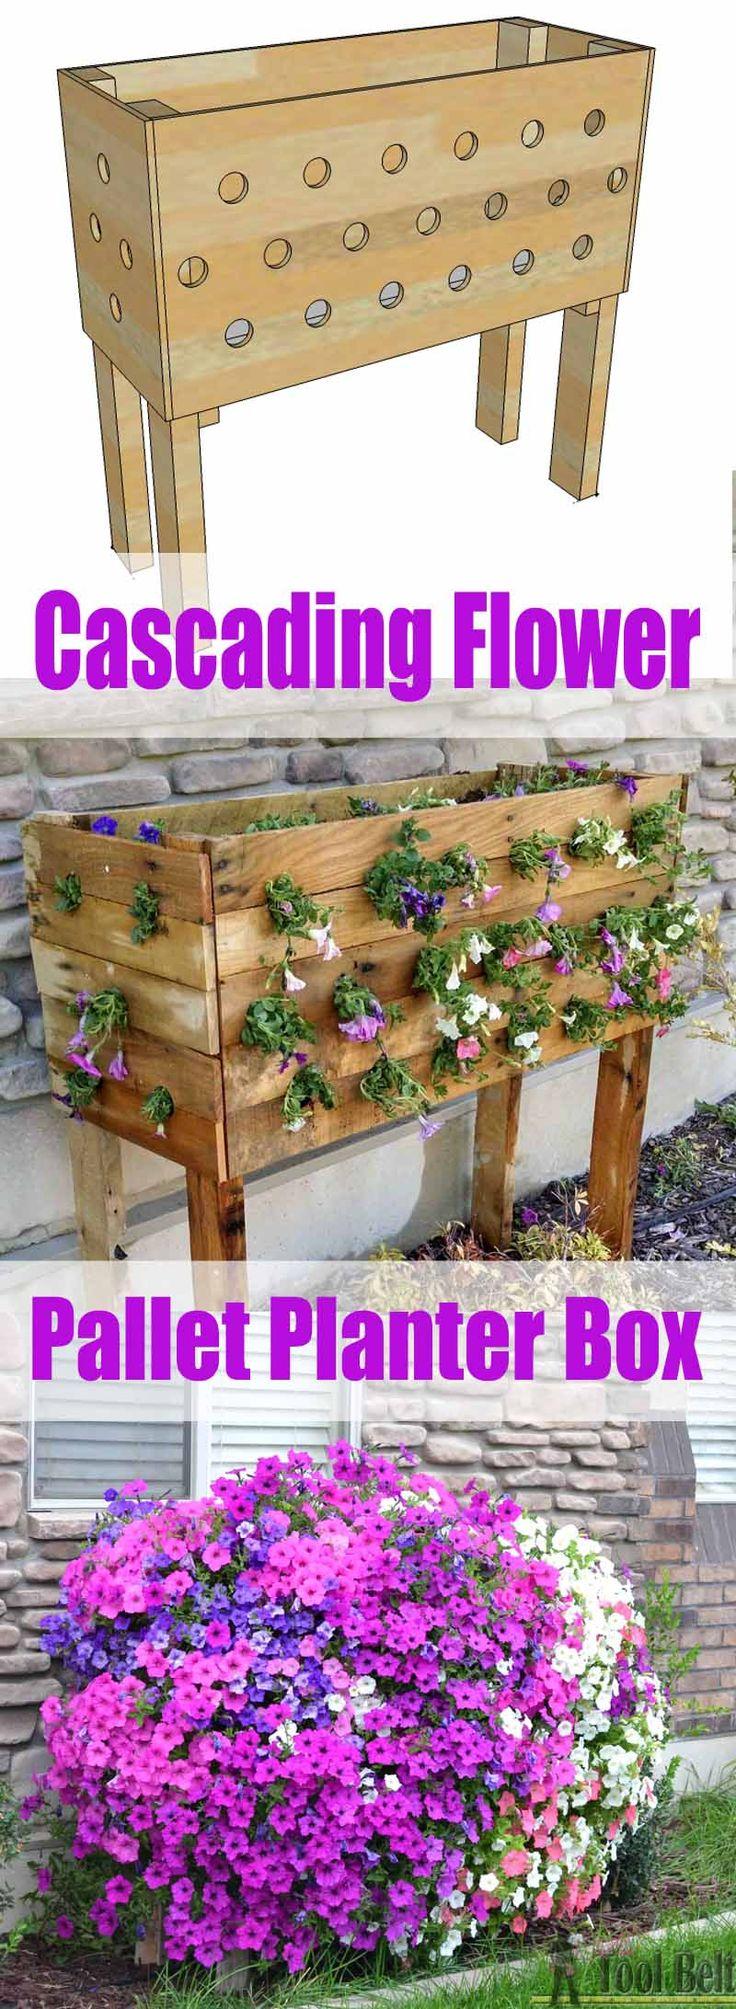 Pallet Cascading Flower Planter Box Plans and Tutorial | 19 Inspiring DIY Pallet Planter Ideas